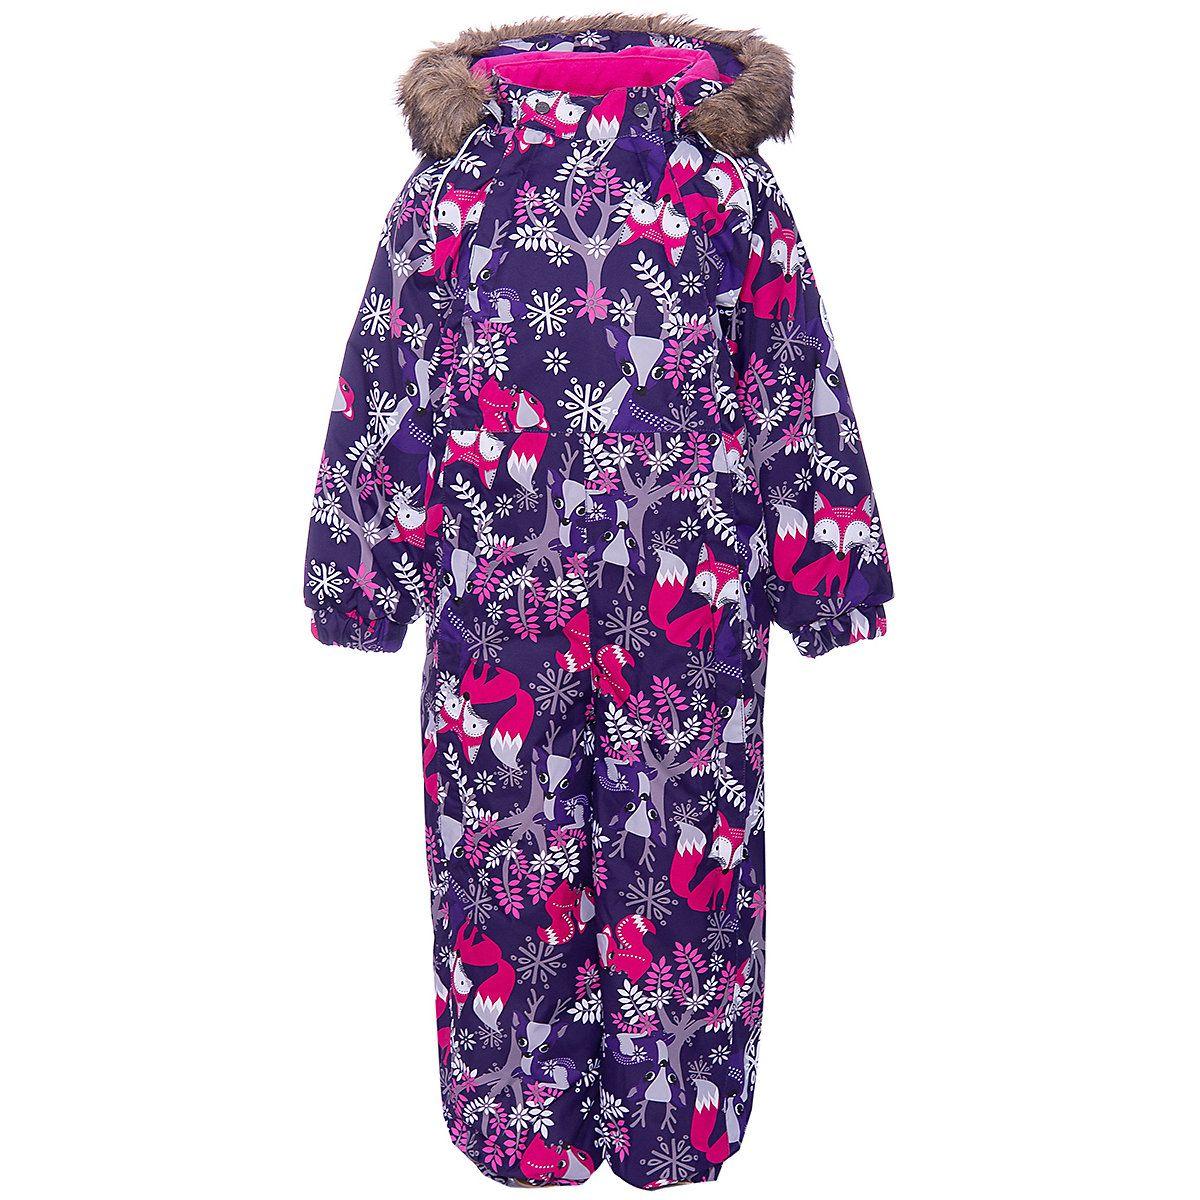 Overalls HUPPA für mädchen 8959202 Baby Strampler Overall Kinder kleidung Kinder